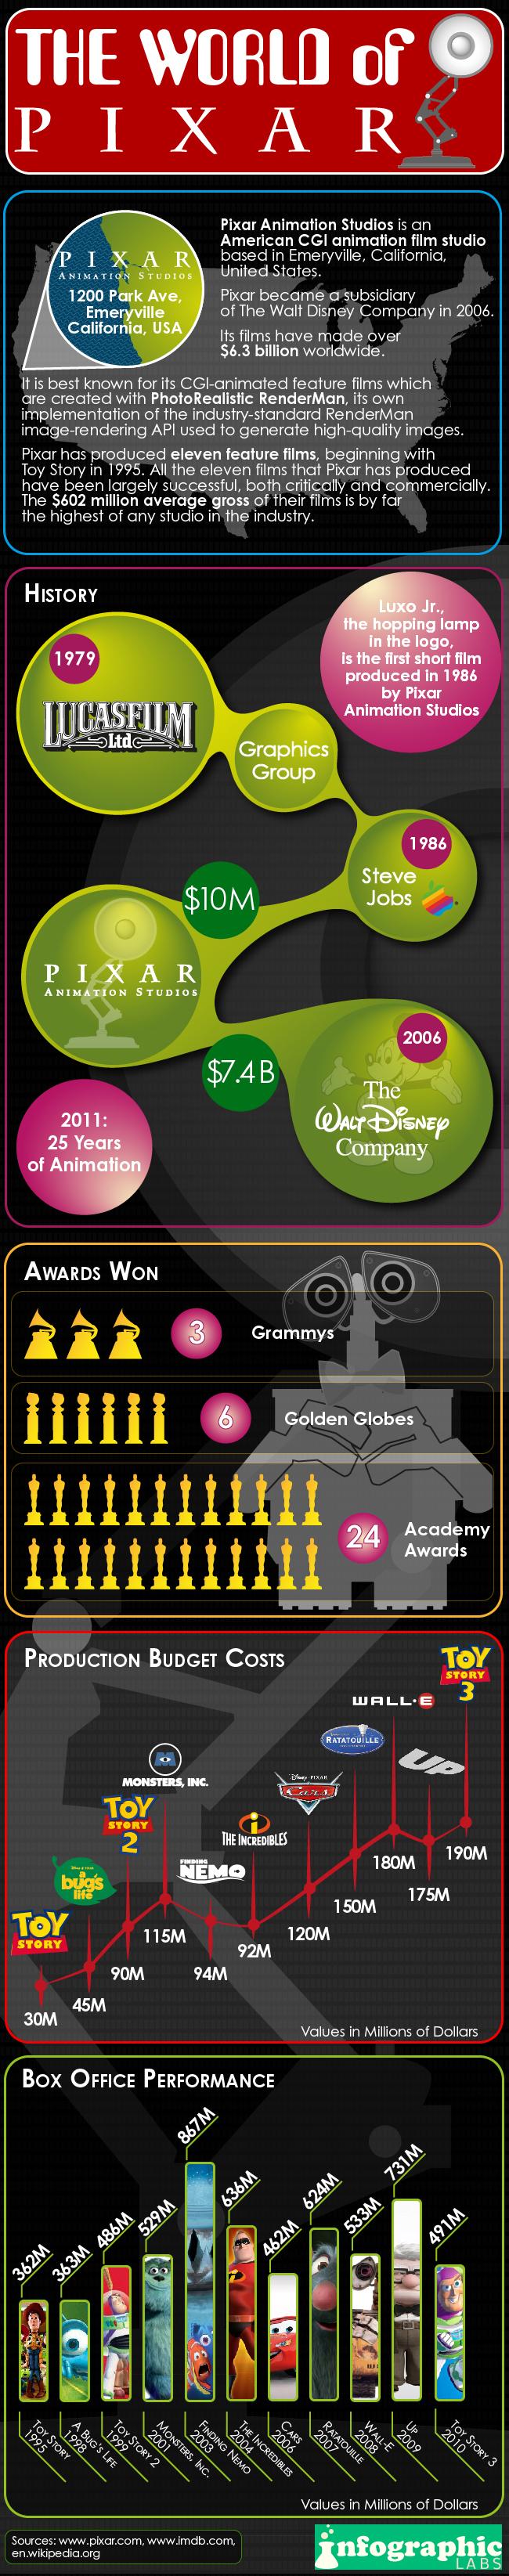 World of Pixar